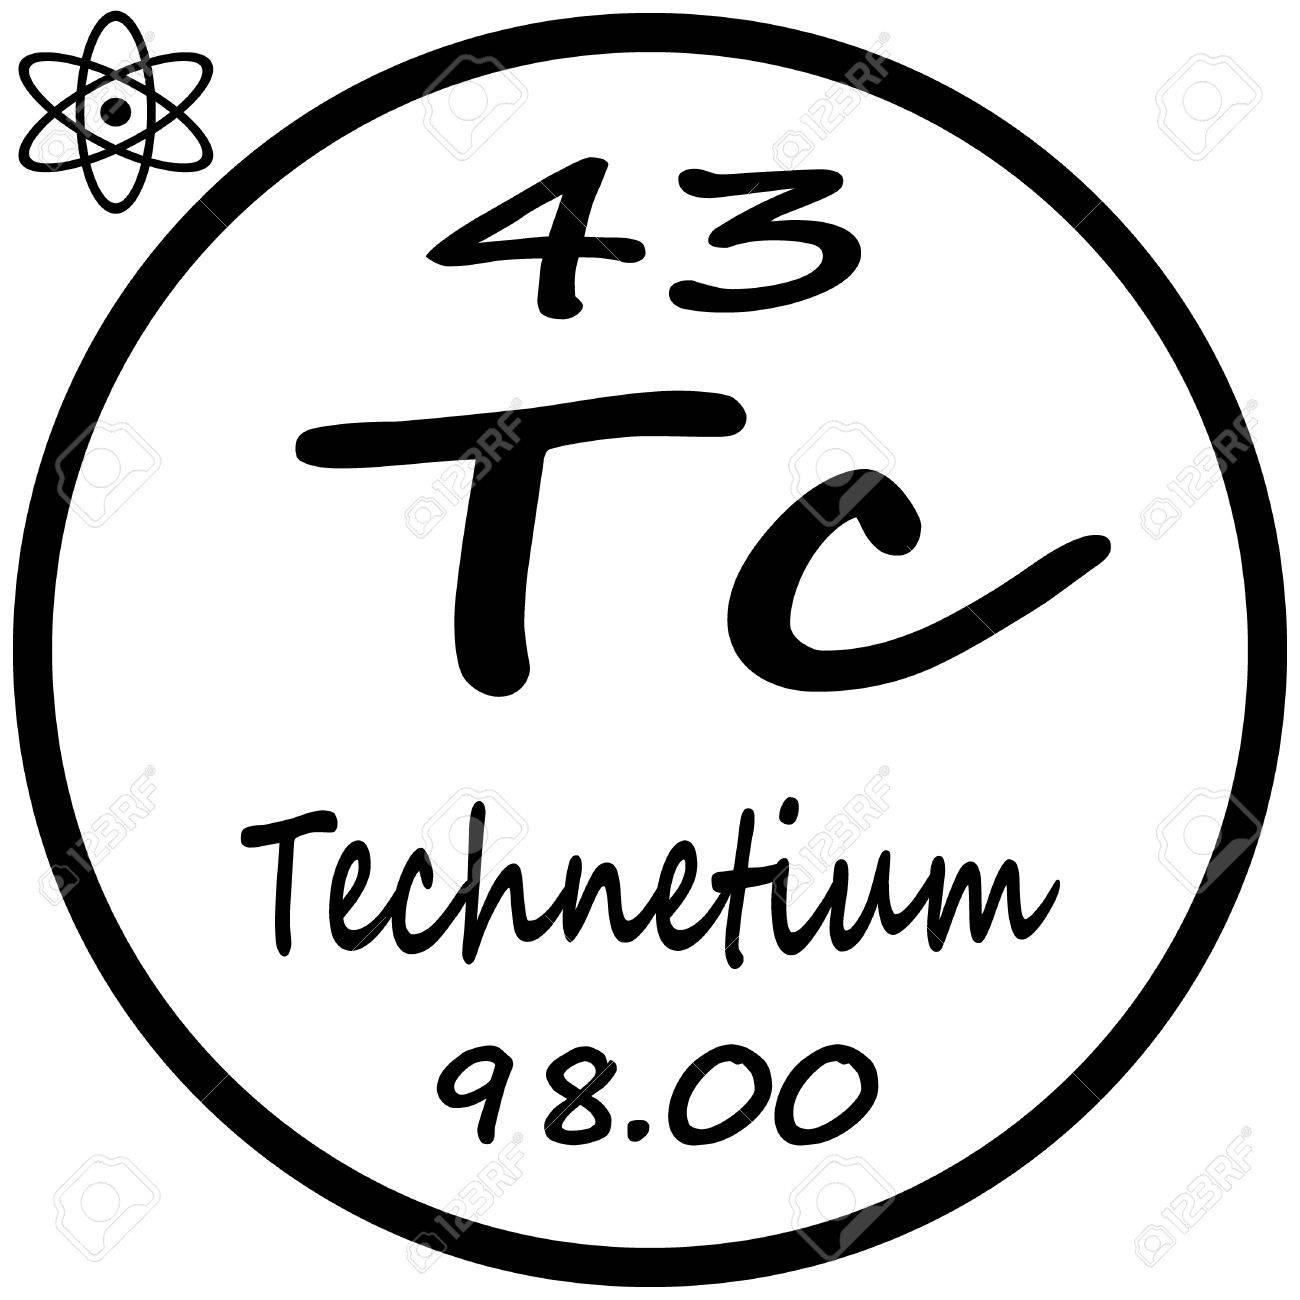 Periodic table of elements technetium royalty free cliparts periodic table of elements technetium stock vector 53482494 urtaz Images